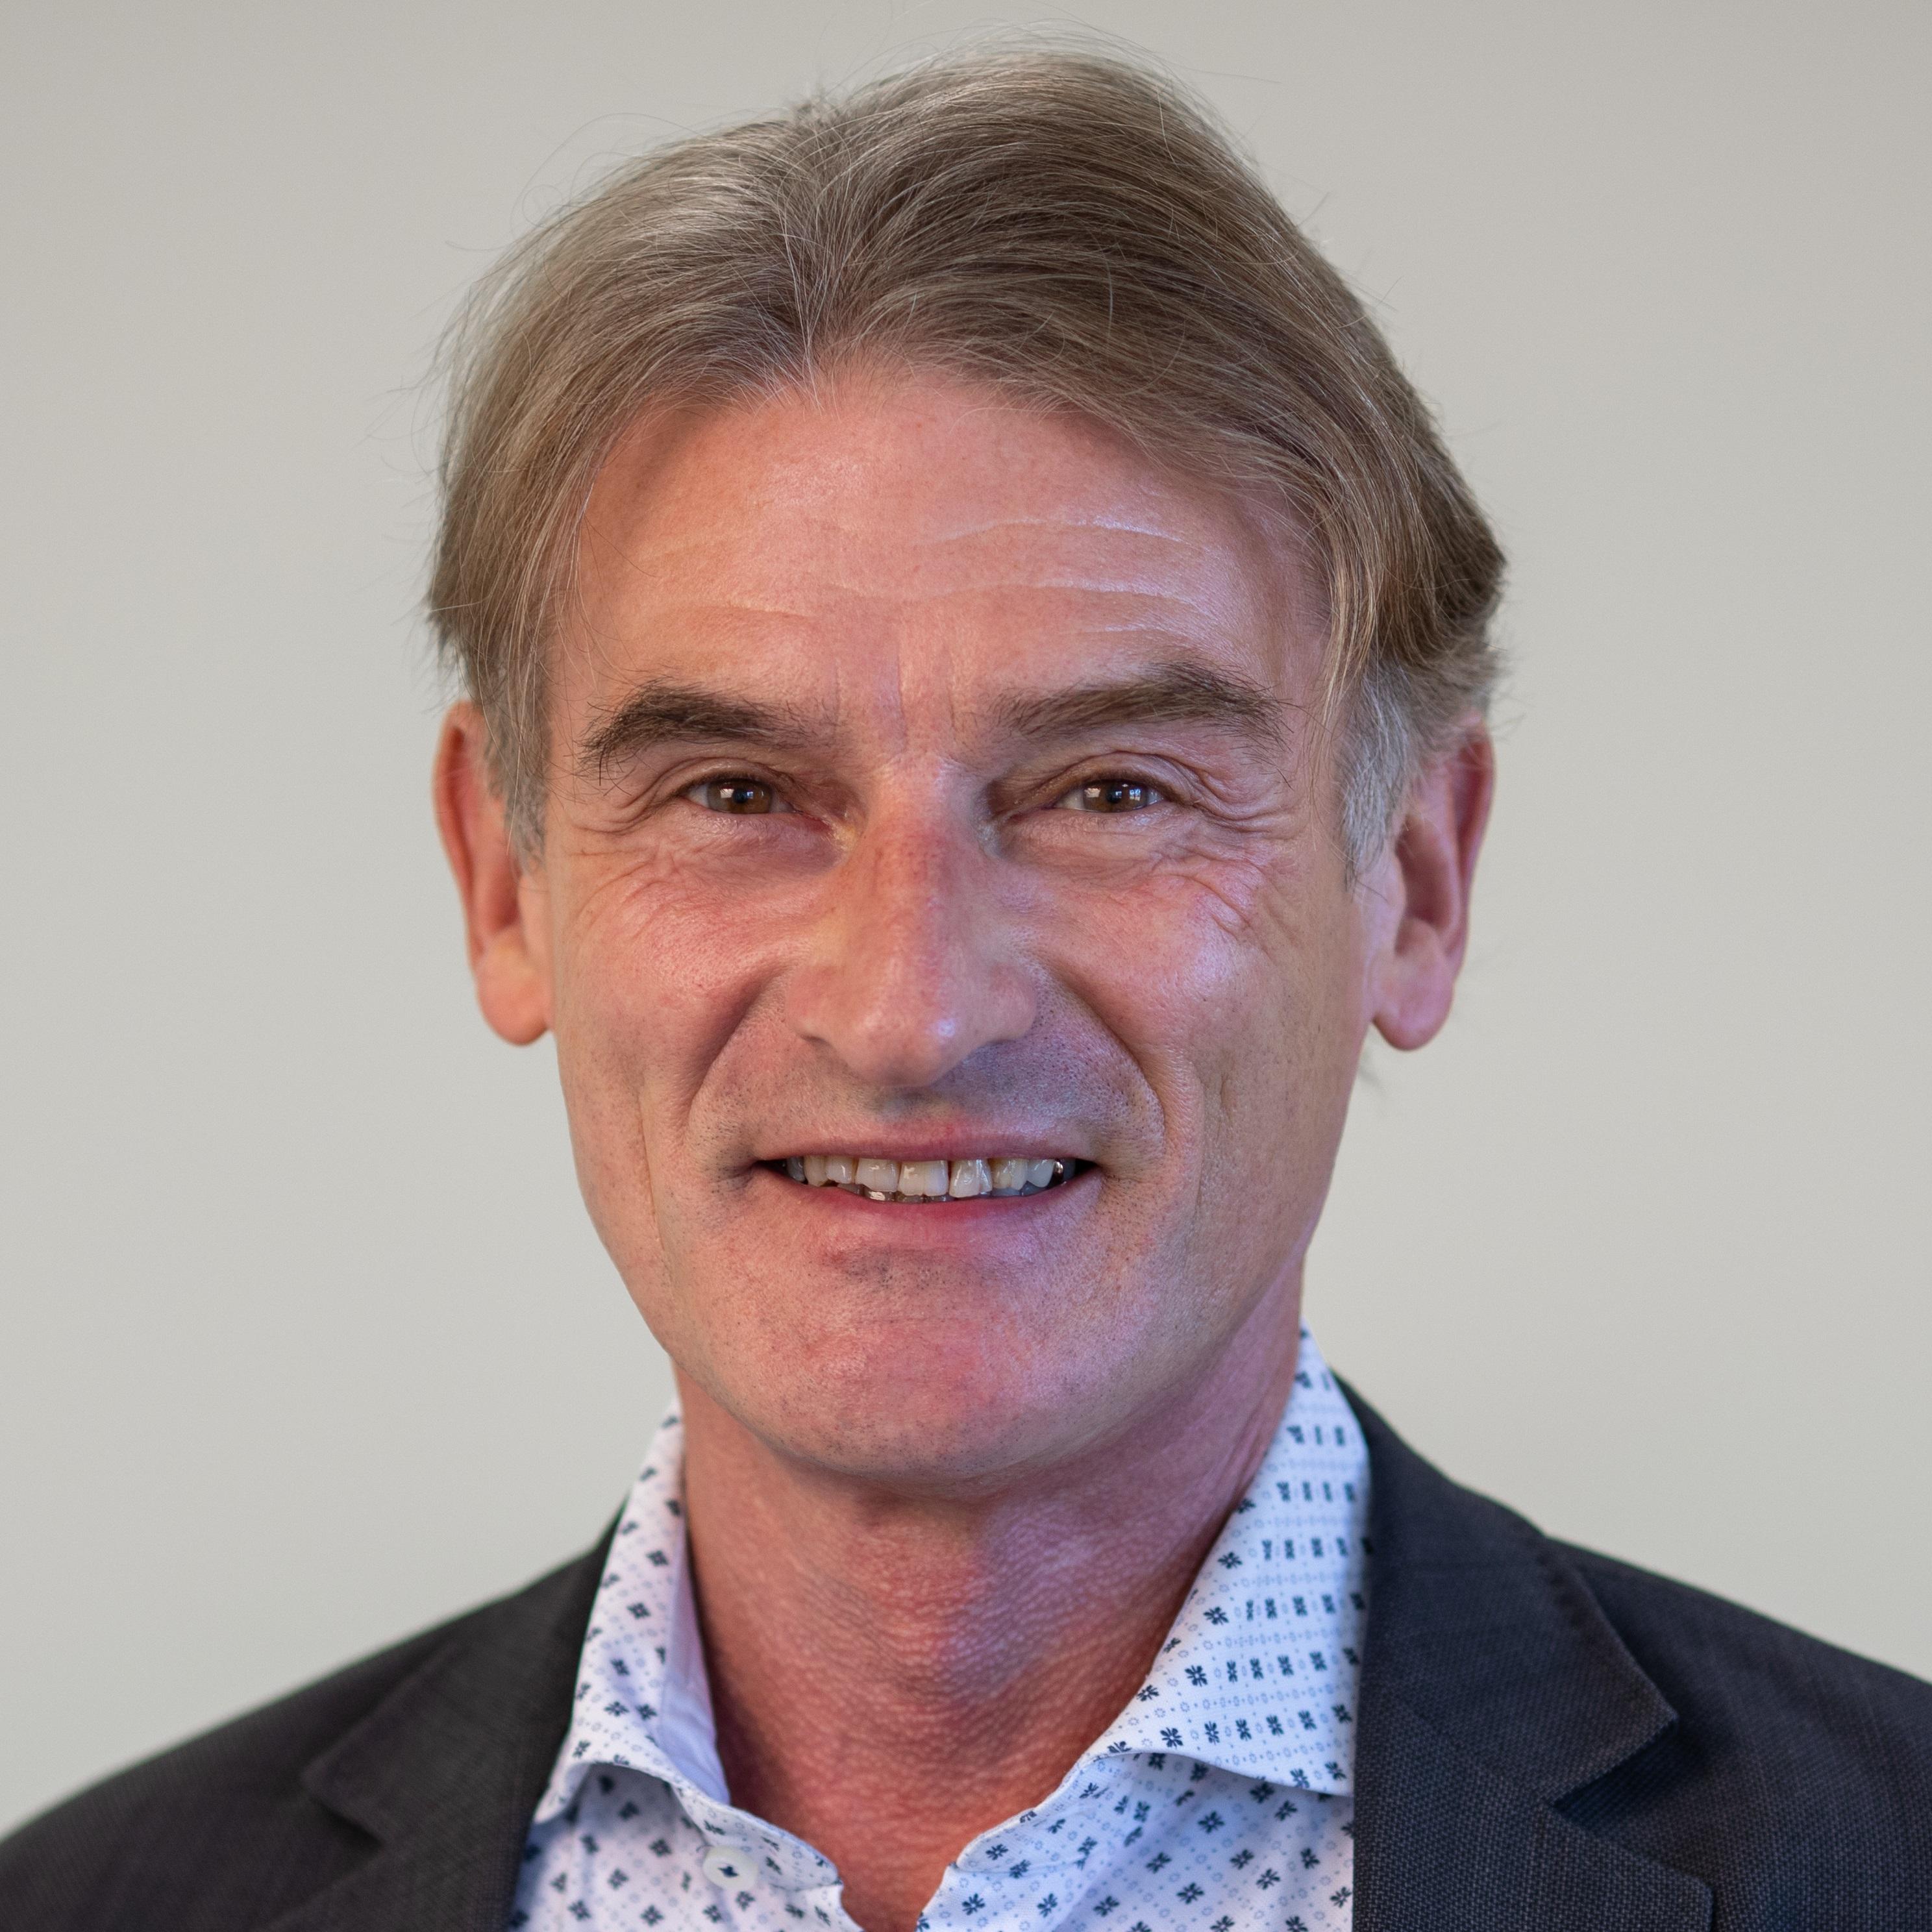 Gerhard Menke